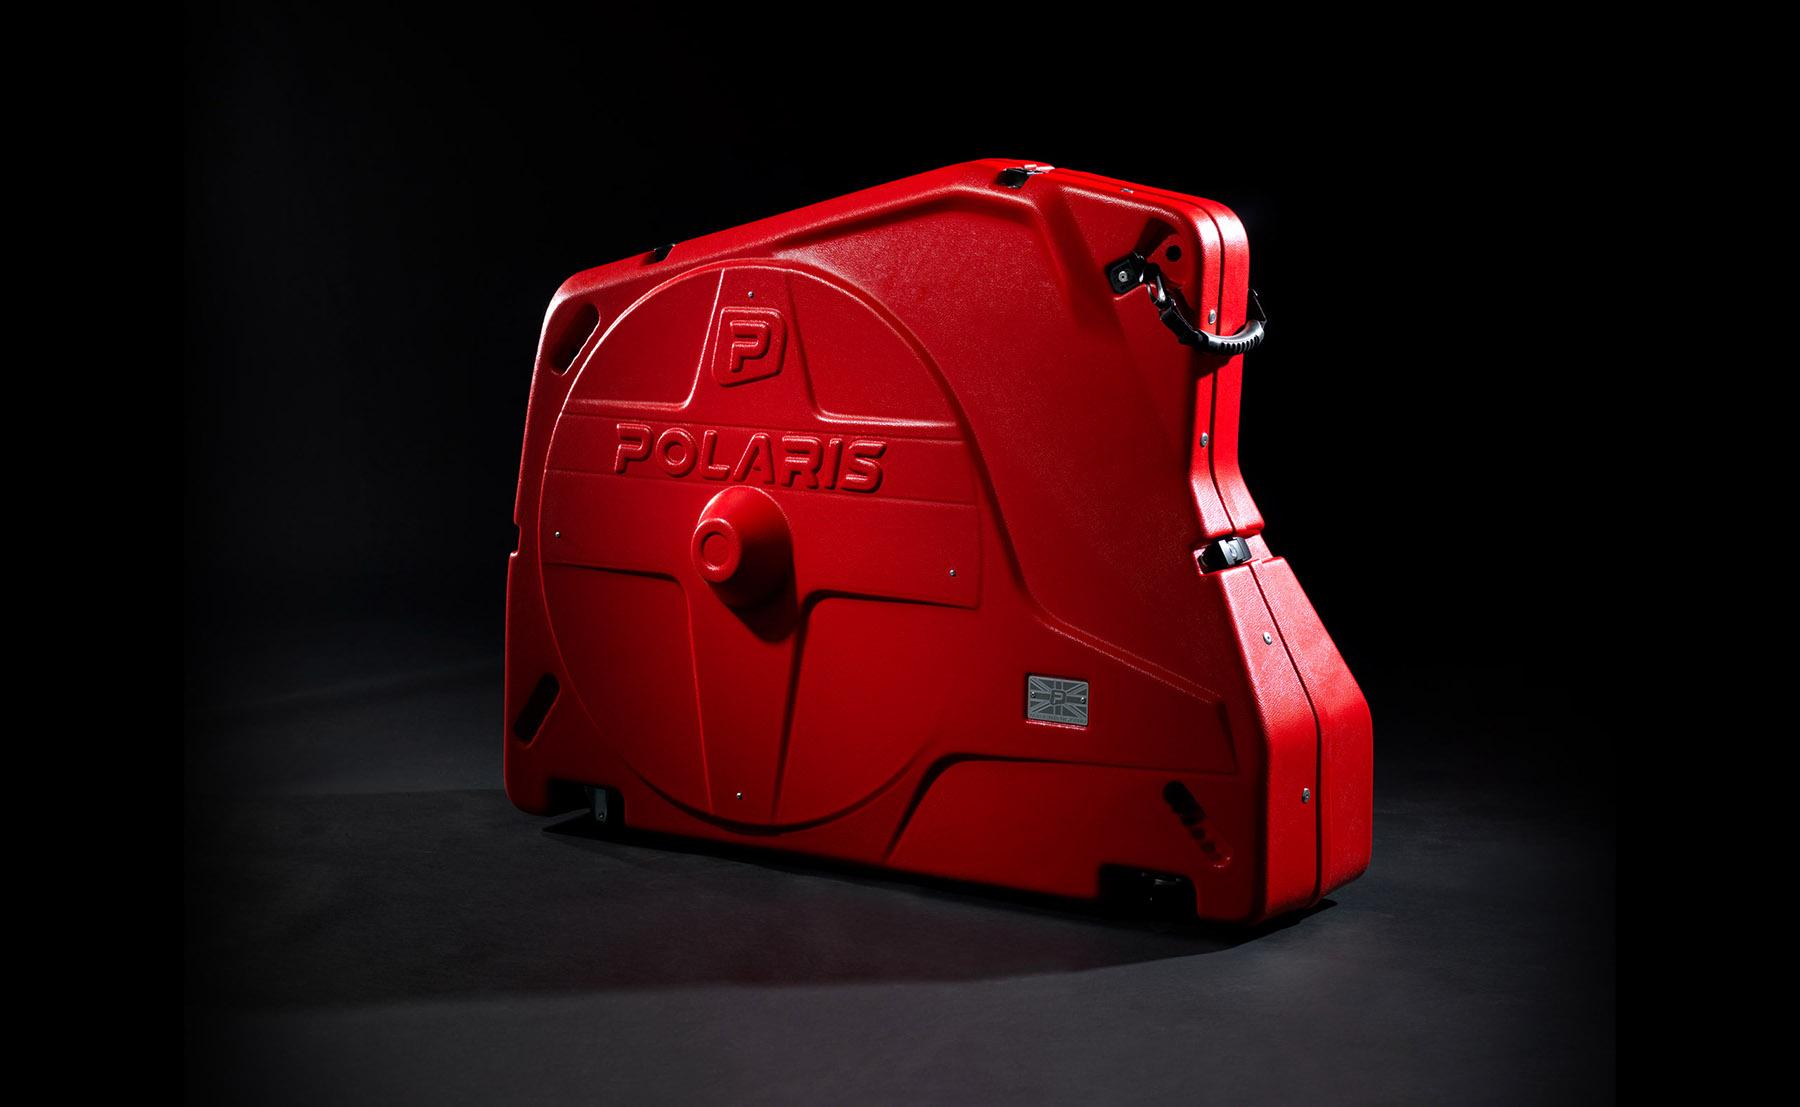 polaris bikewear bikepod by Leeds based Freelance Designer Neil Holroyd